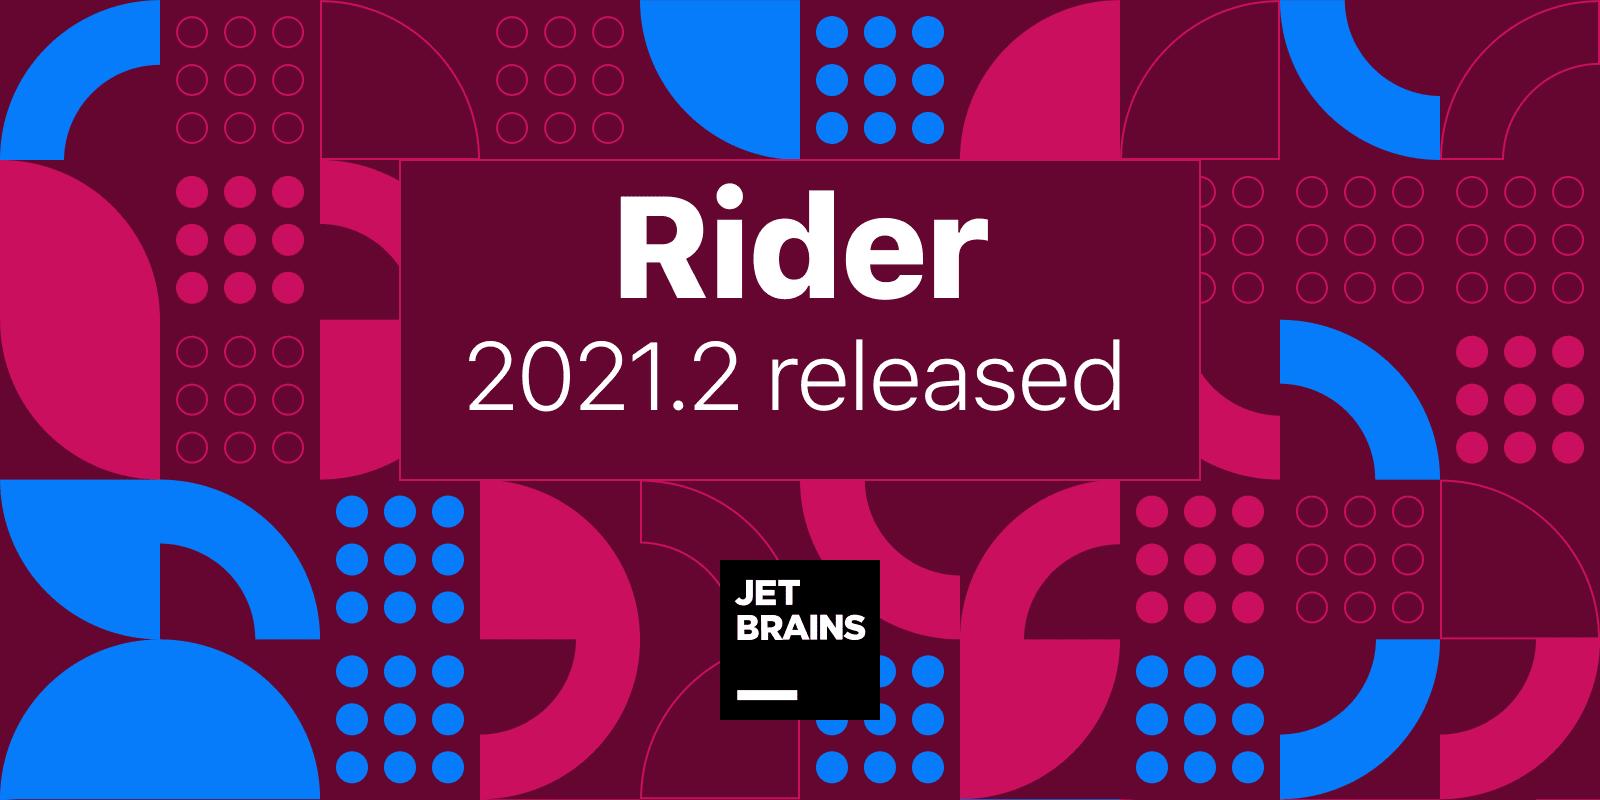 Встречайте Rider 2021.2